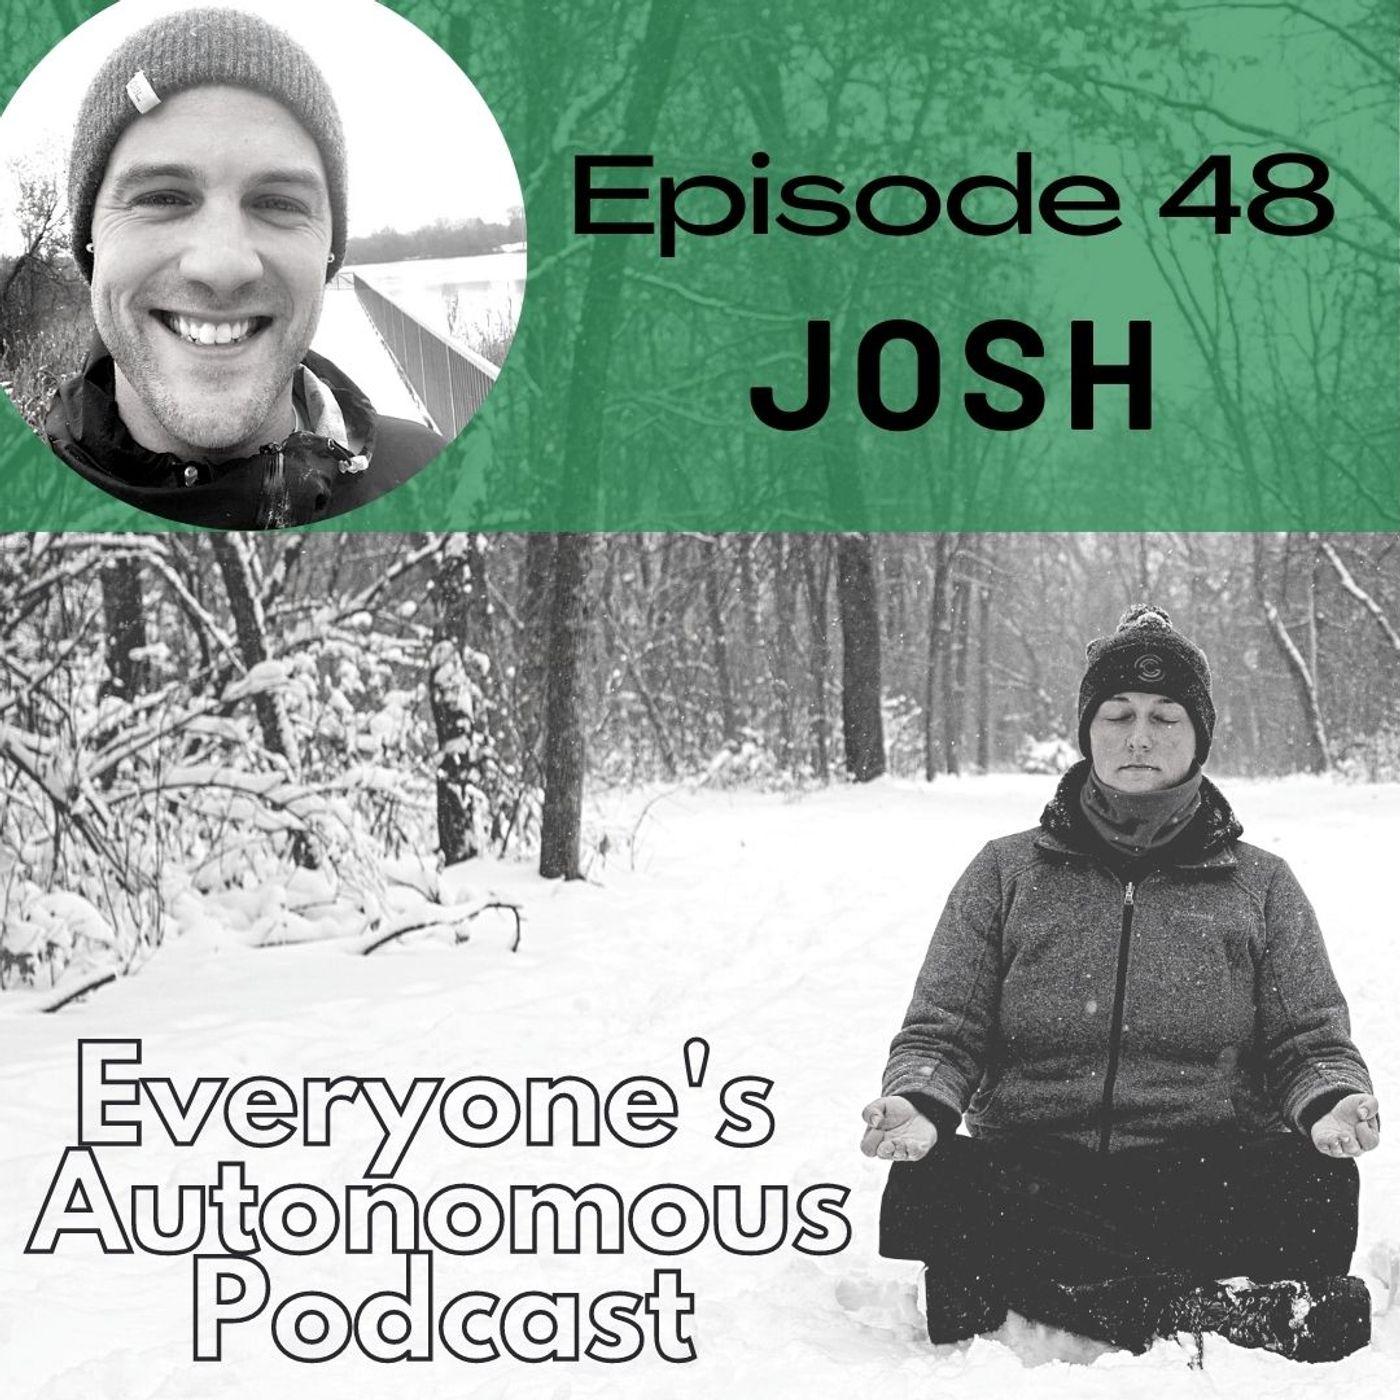 Episode 48: Josh